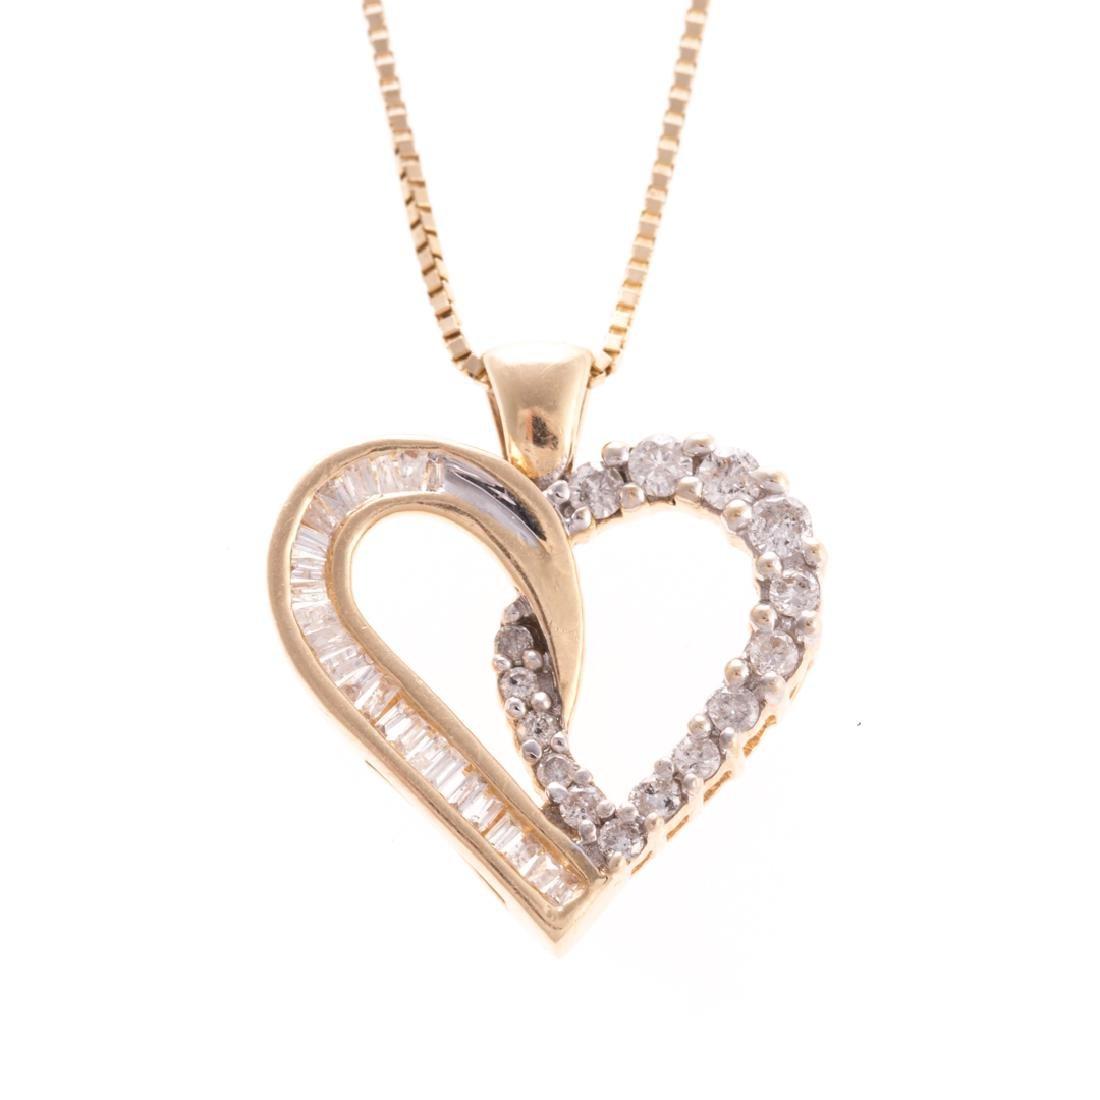 A Lady's Open Heart Diamond Pendant in Gold